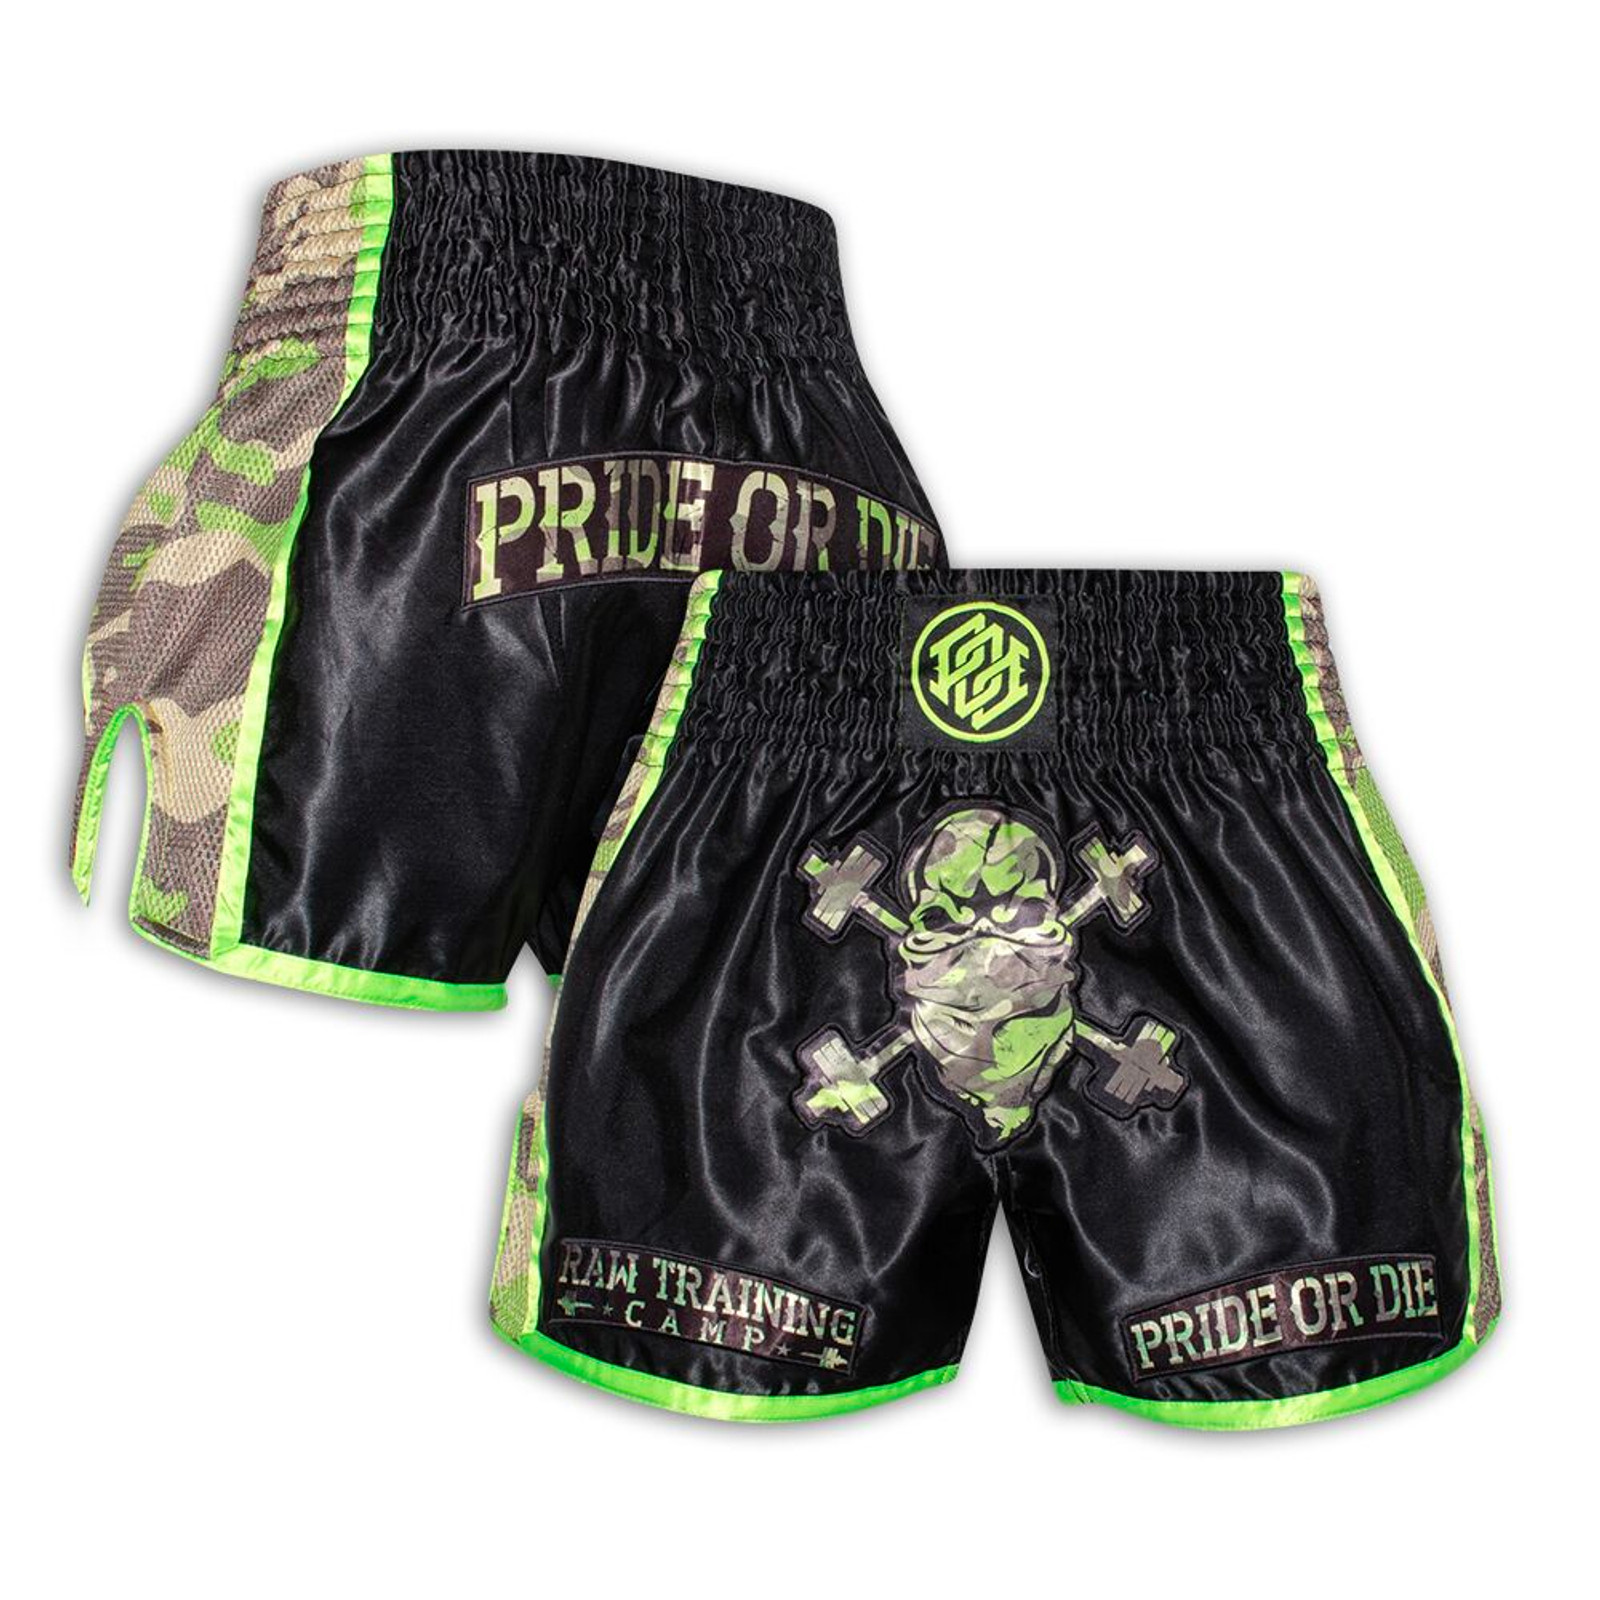 Pride Or Die Muay Thai Shorts RAW TRAINING CAMP Jungle Camo